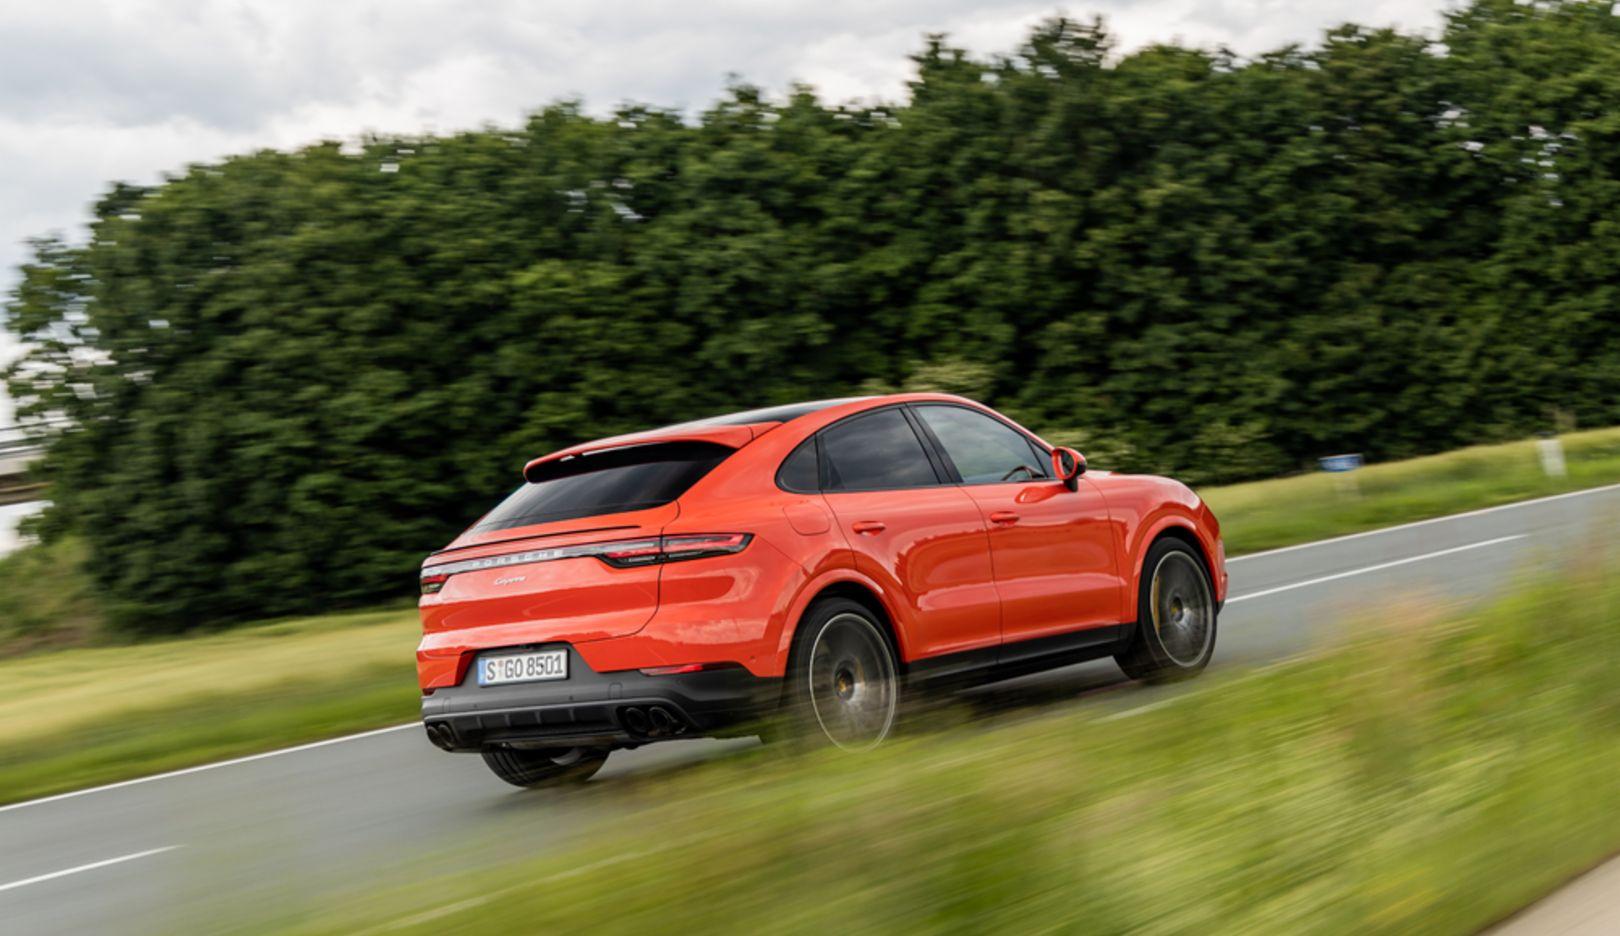 Cayenne Coupé, 2019, Porsche AG